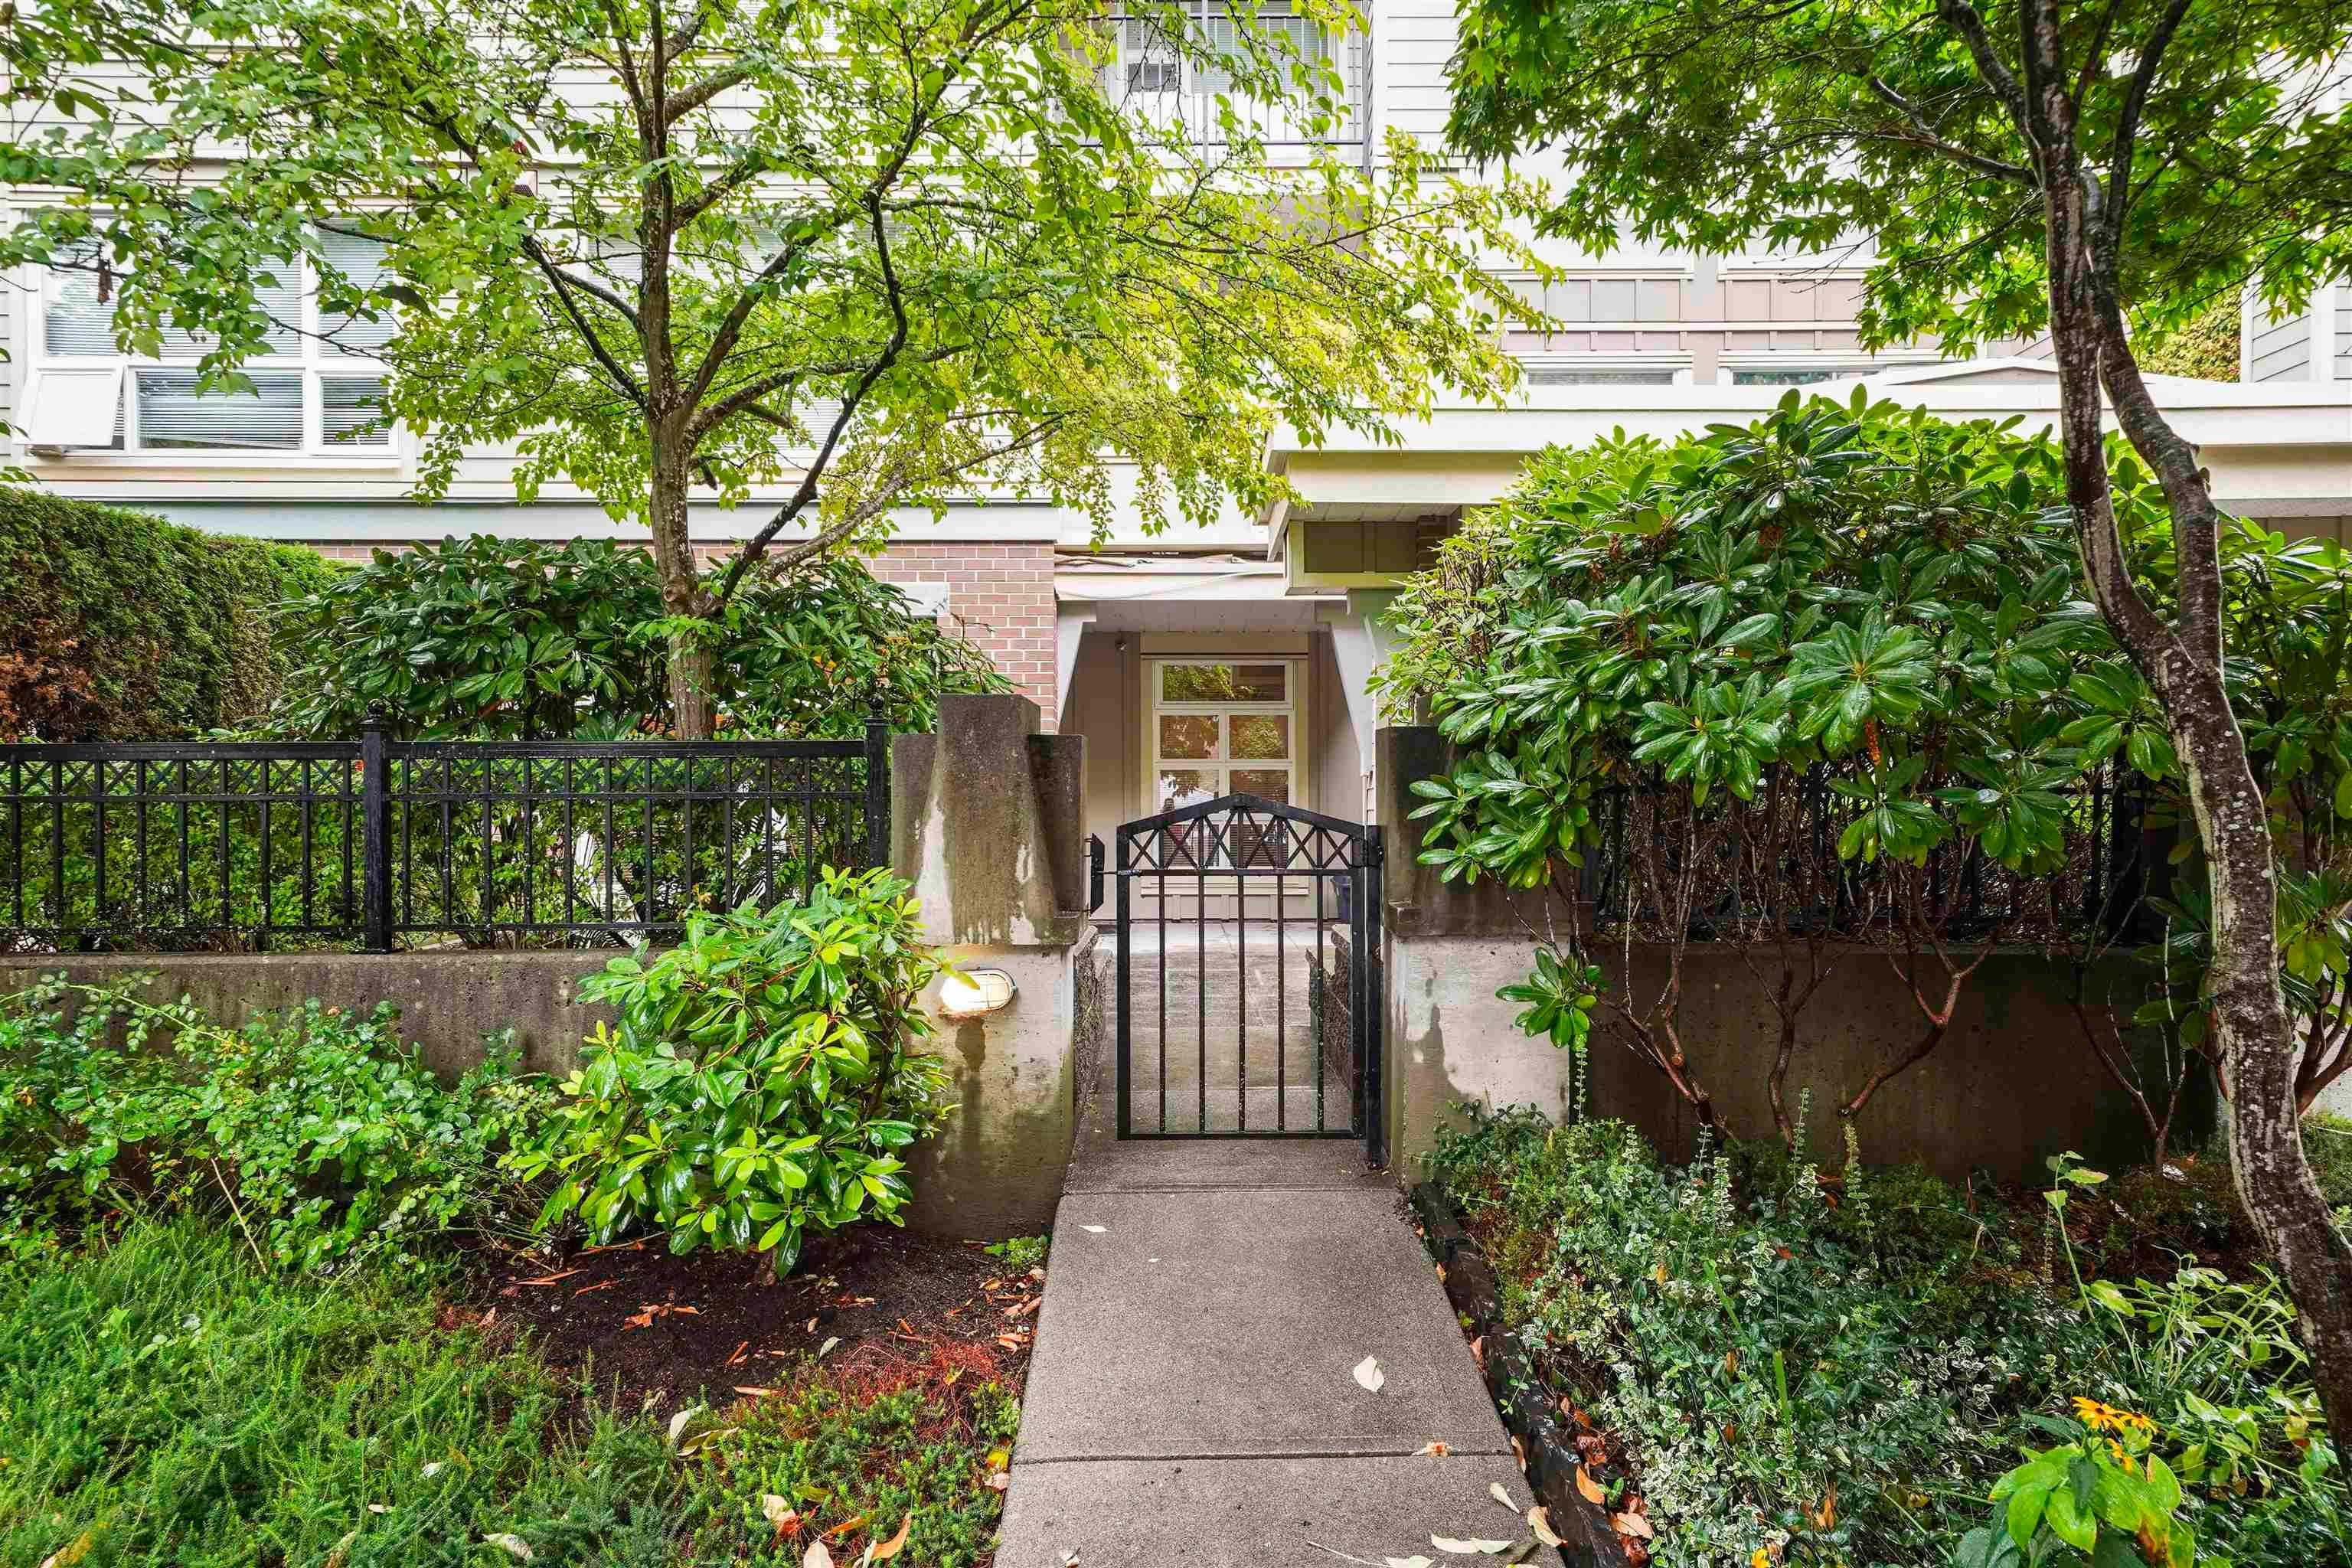 101 3575 EUCLID AVENUE - Collingwood VE Apartment/Condo for sale, 1 Bedroom (R2618333) - #1